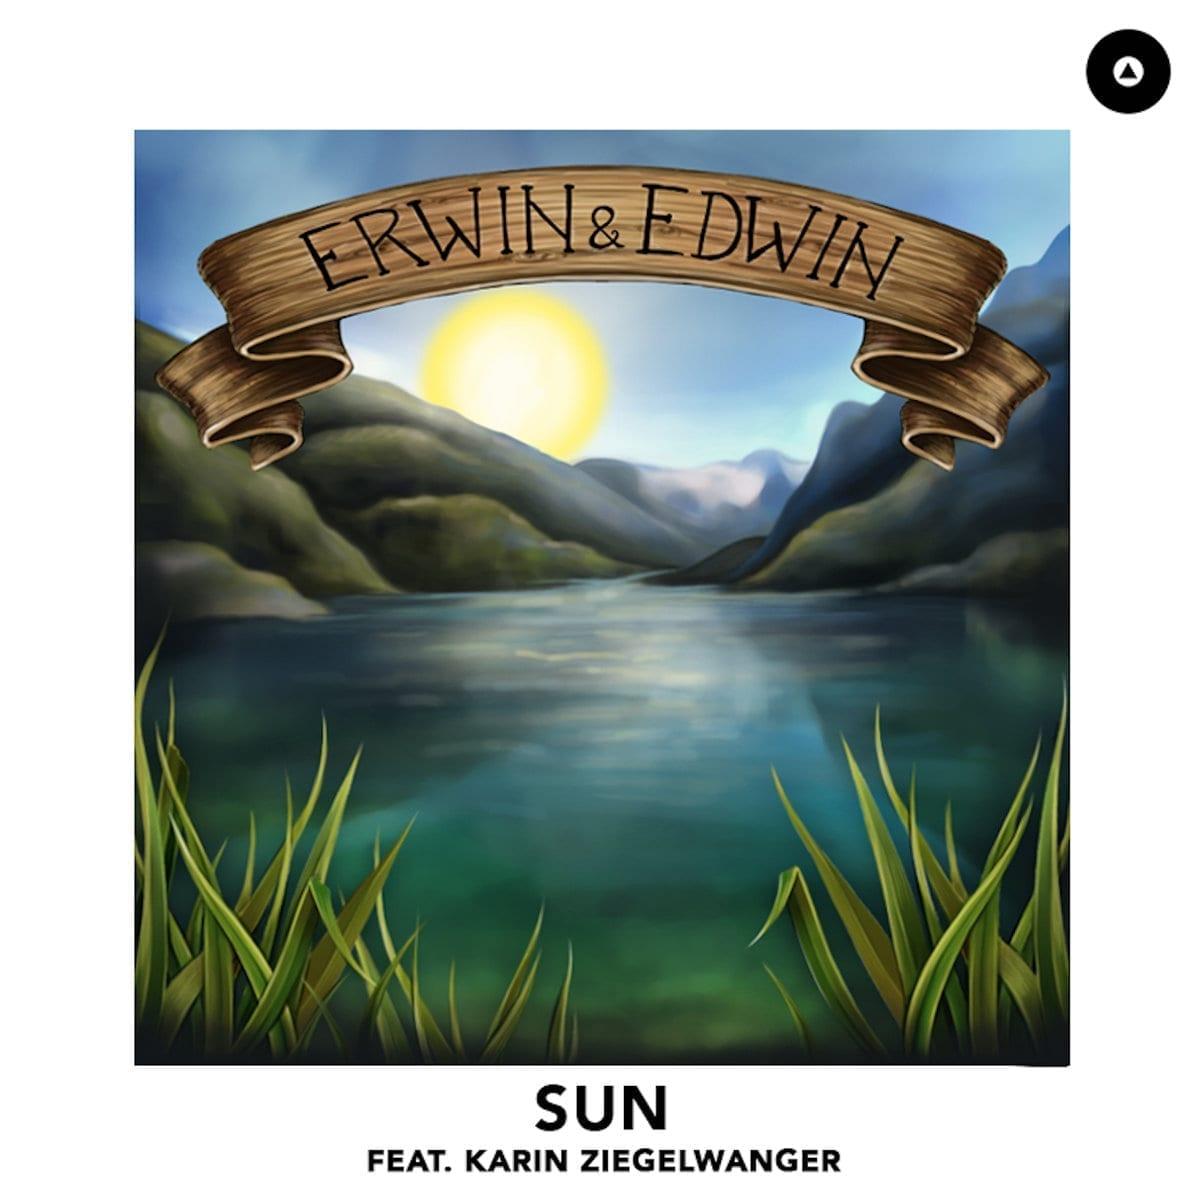 Erwin & Edwin Sun Mastering